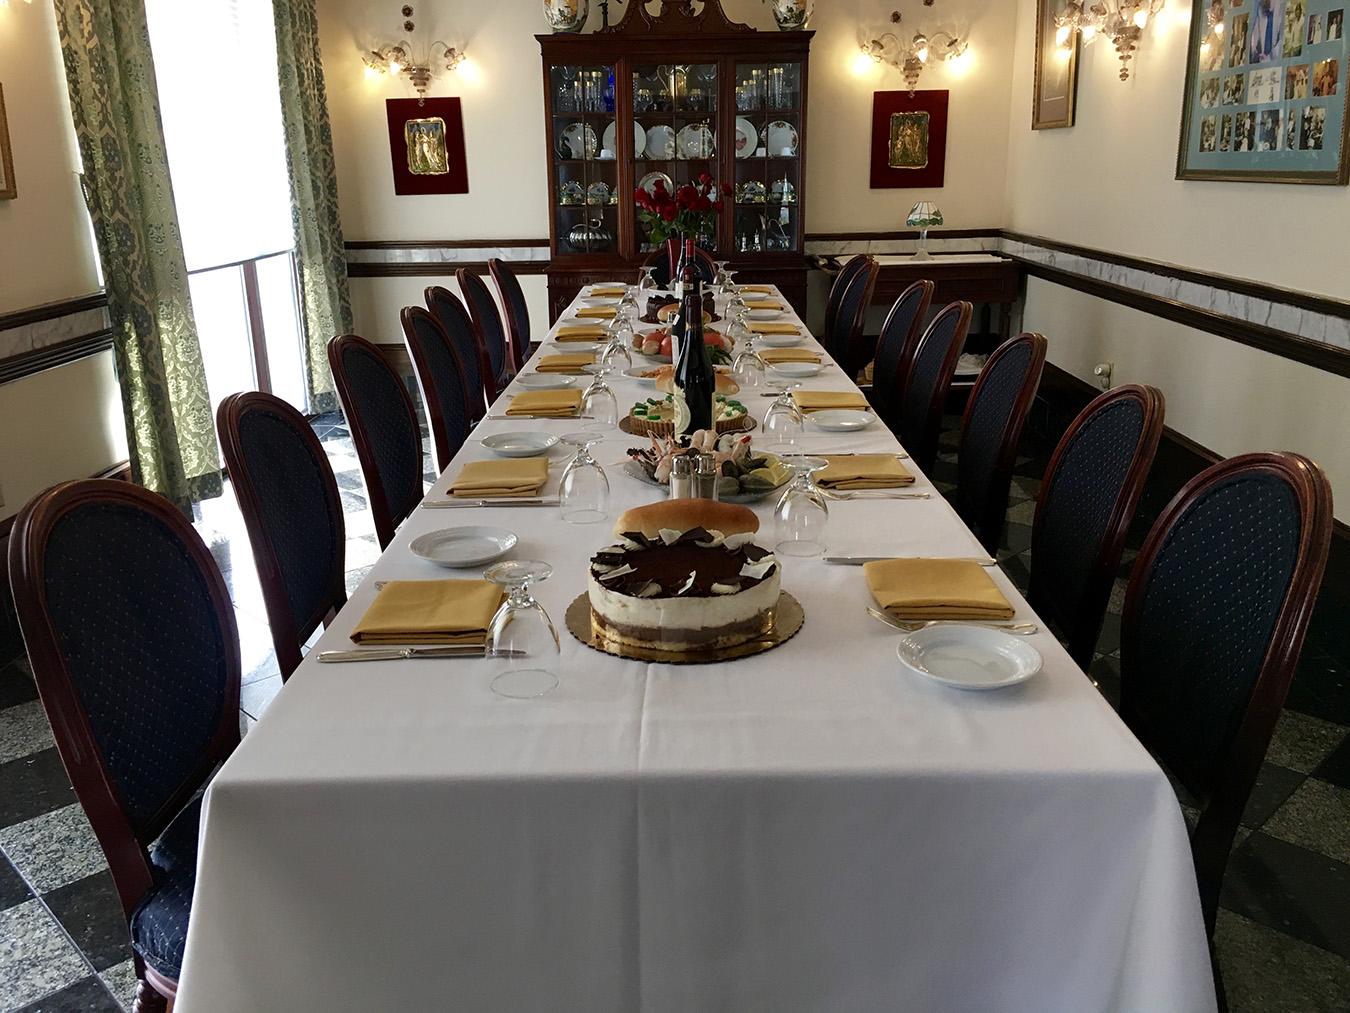 Ristorante la perla of washington dc georgetown s five for Best private dining rooms washington dc